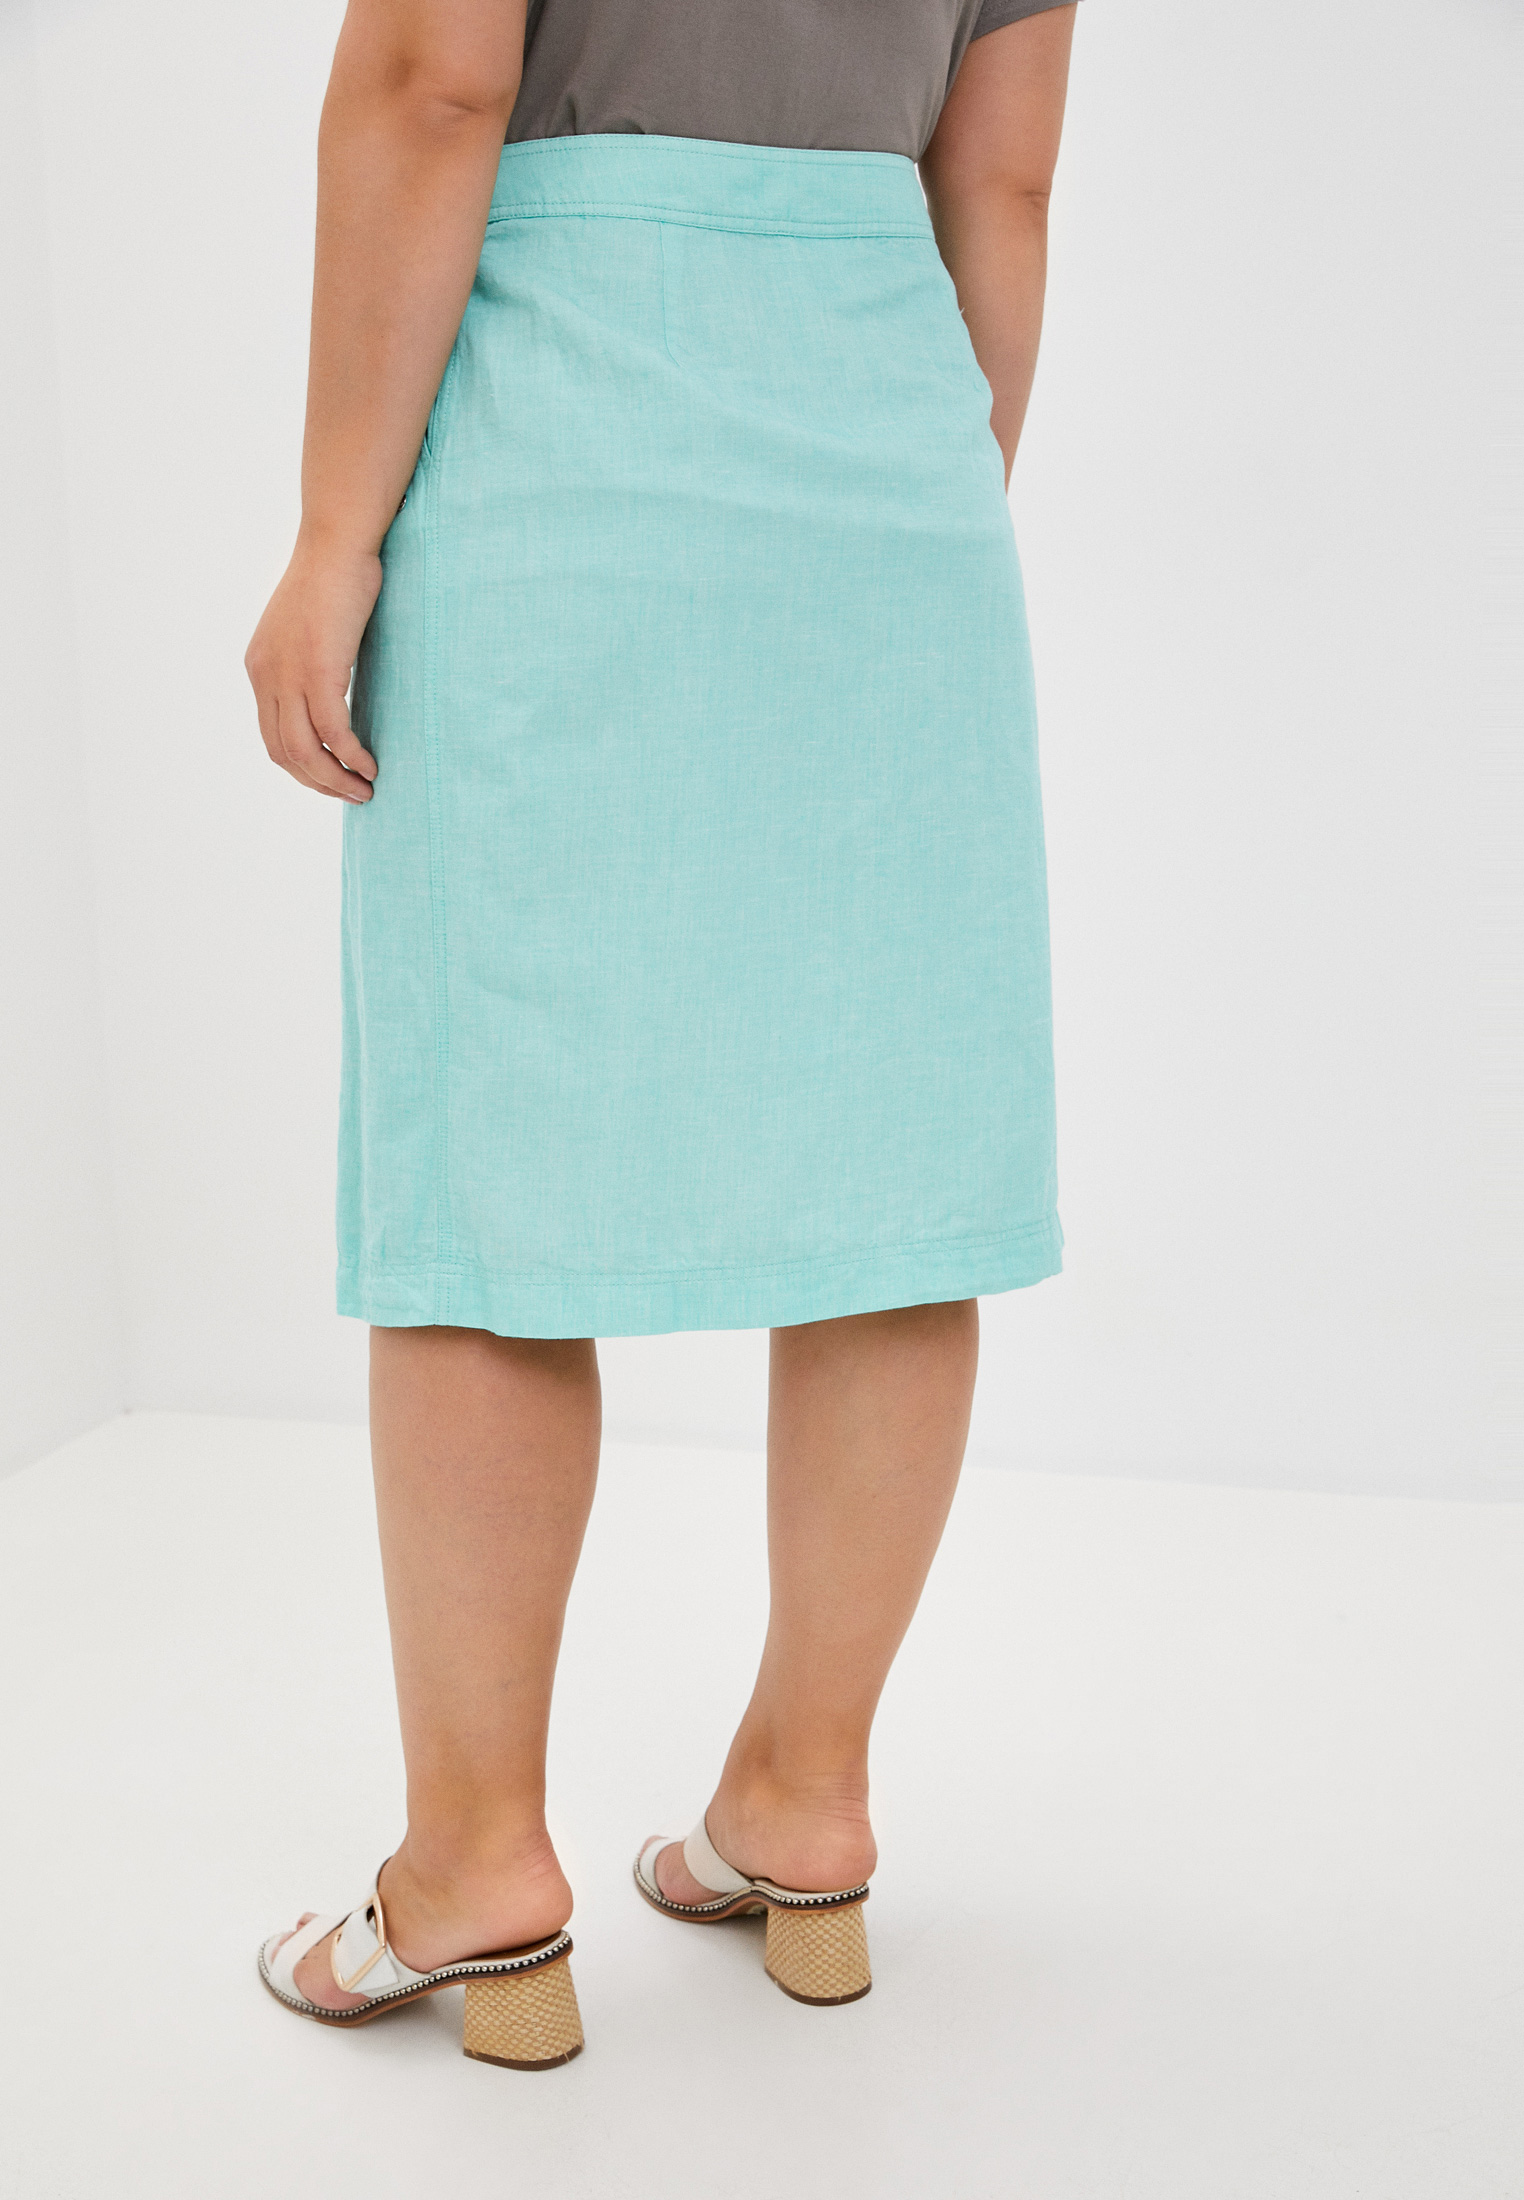 Прямая юбка Finn Flare (Фин Флаер) S18-11012: изображение 3